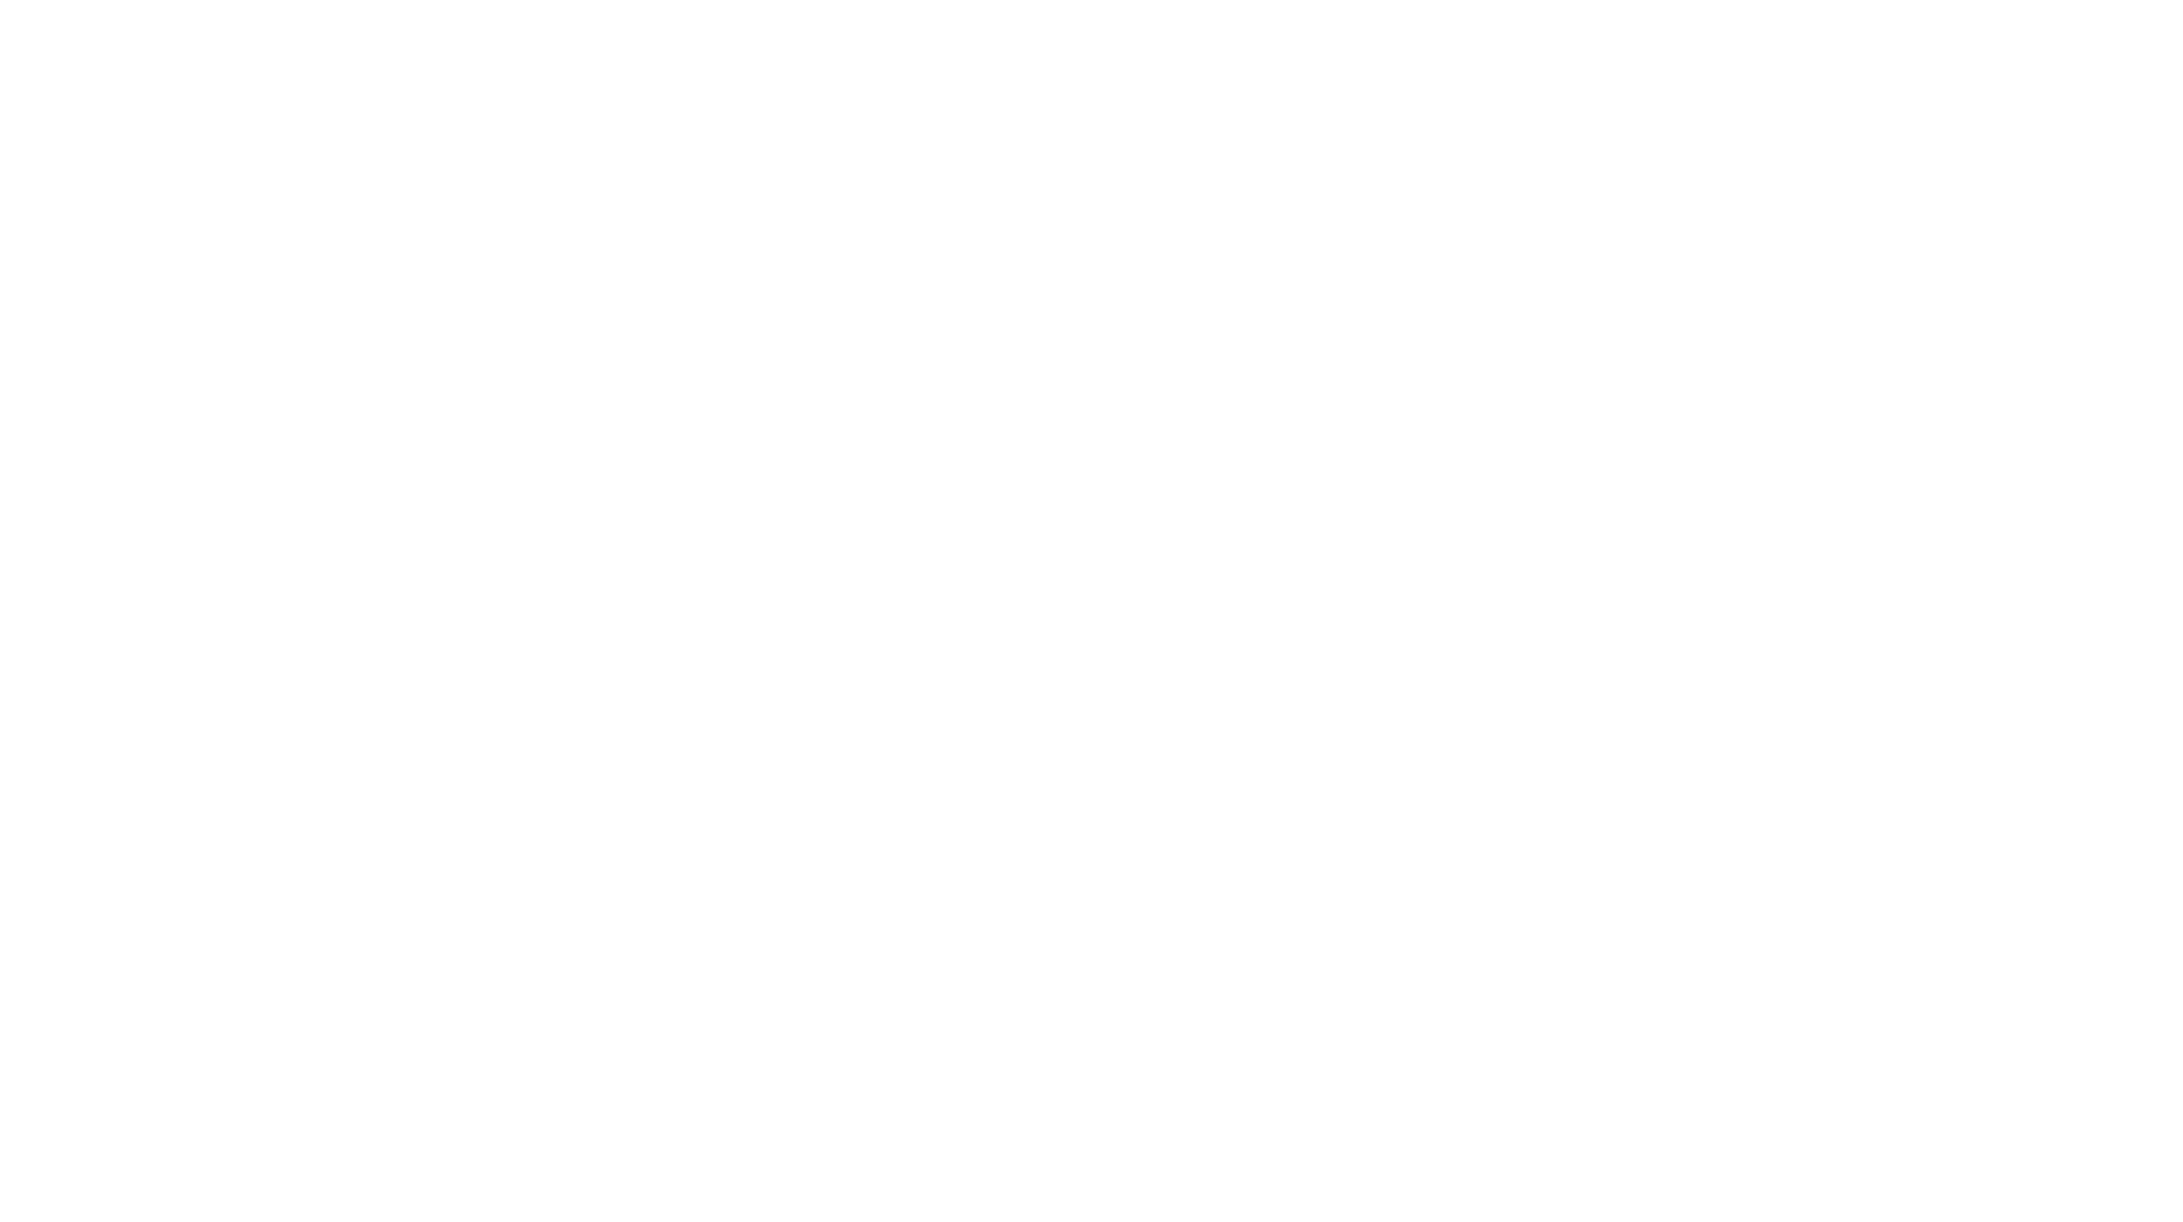 Blackfin BF736 RAYMOND